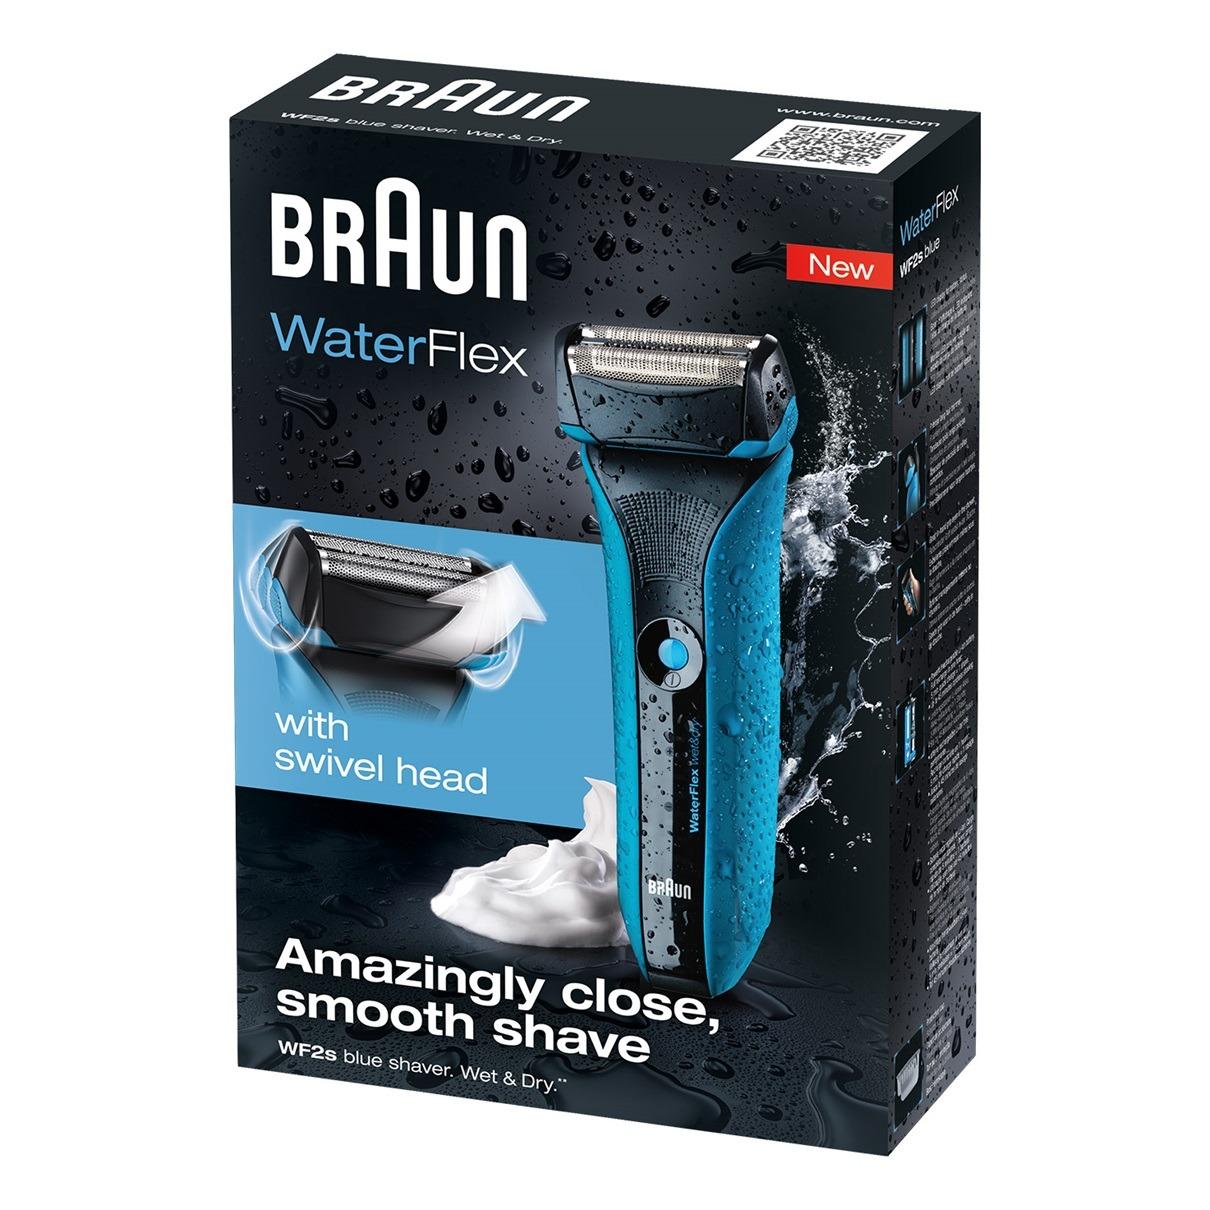 ماكينة حلاقة براون ووتر فليكس Braun Rechargeable Men's Shaver Wet&Dry Blue